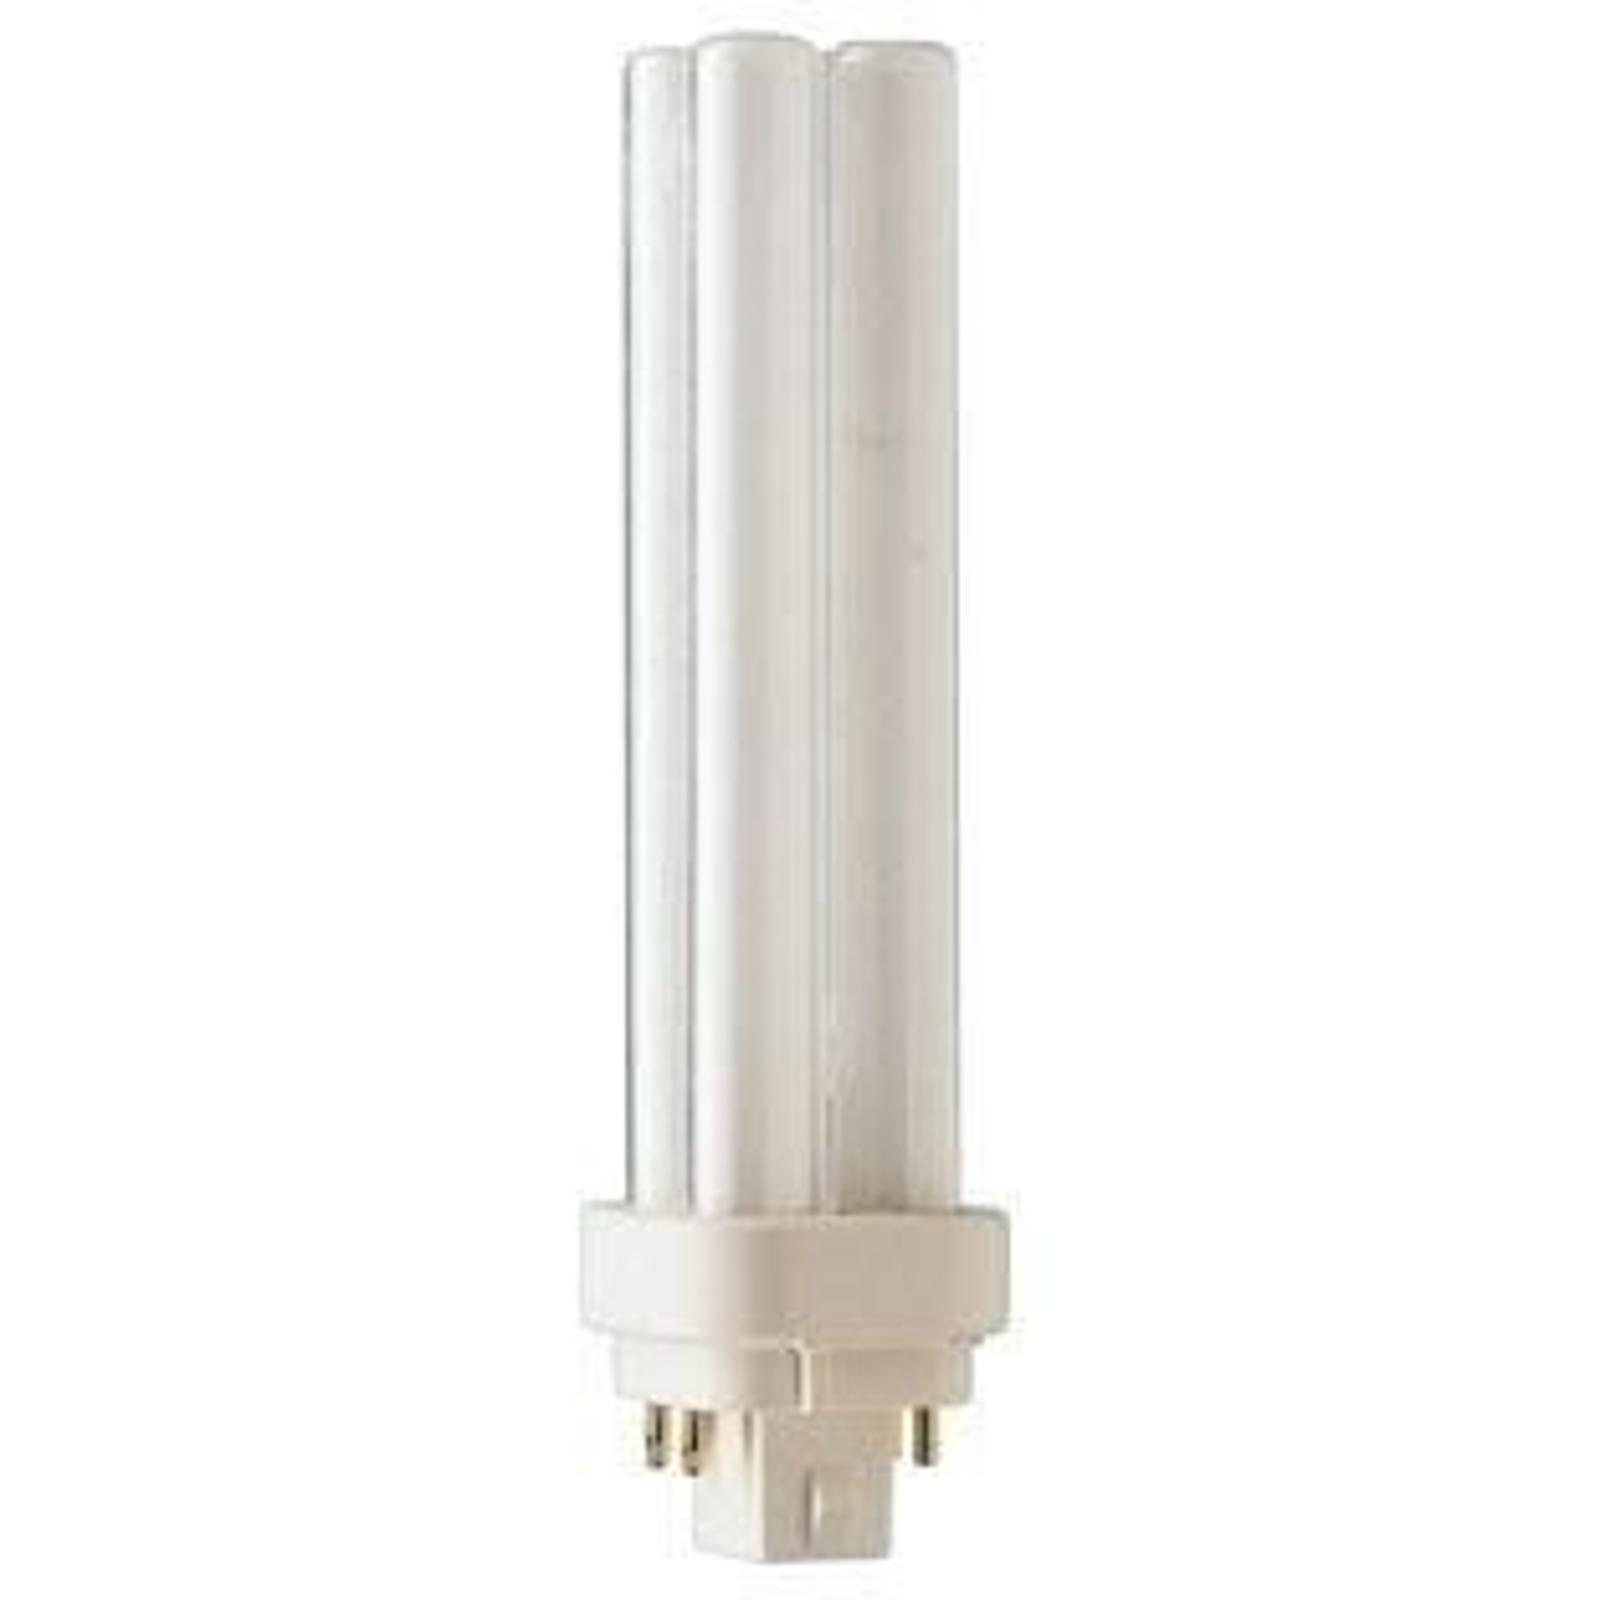 G24q 10W 830 Kompaktleuchtstofflampe DULUX D/E